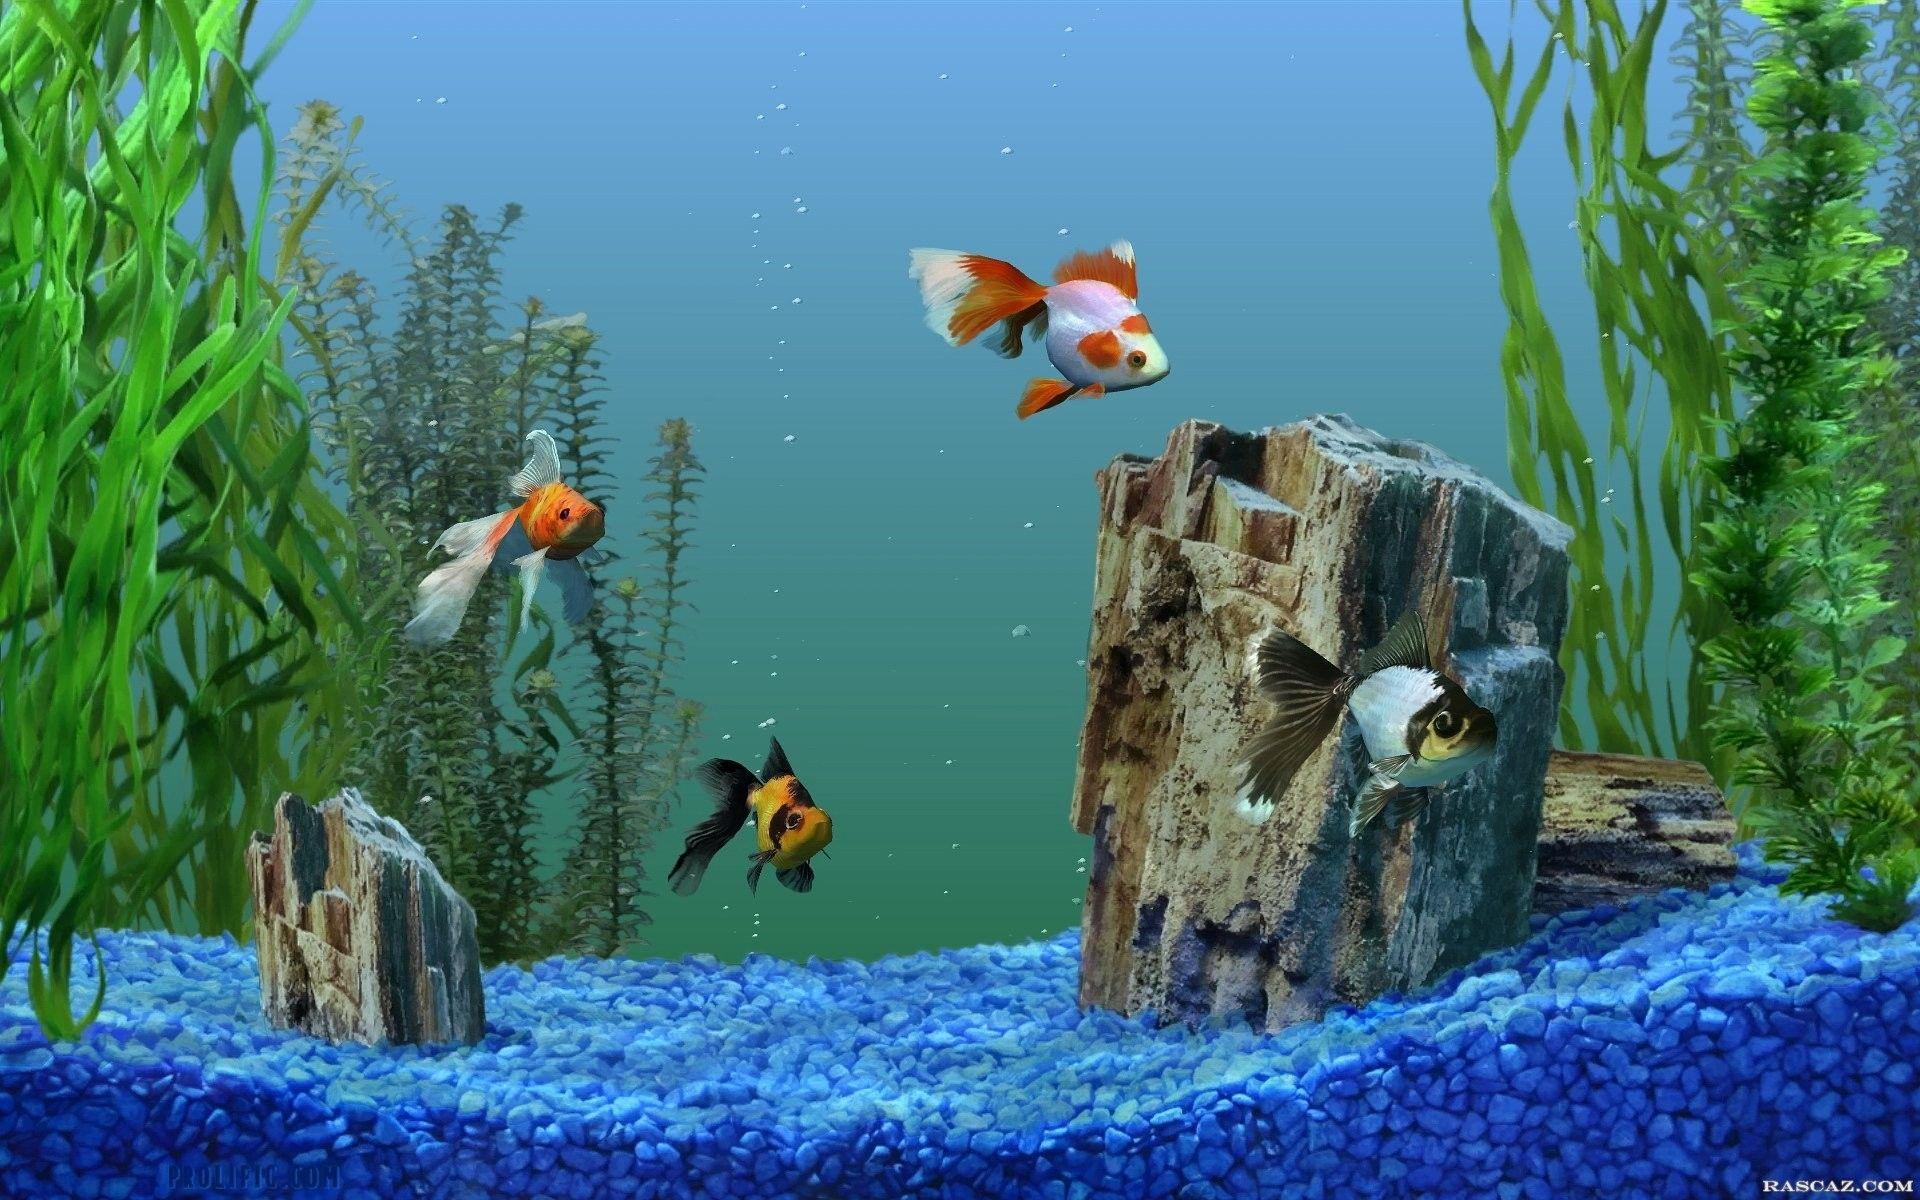 Aquarium Fish Pictures Wallpaper Aquarium Live Wallpaper Aquarium Screensaver Free Animated Wallpaper